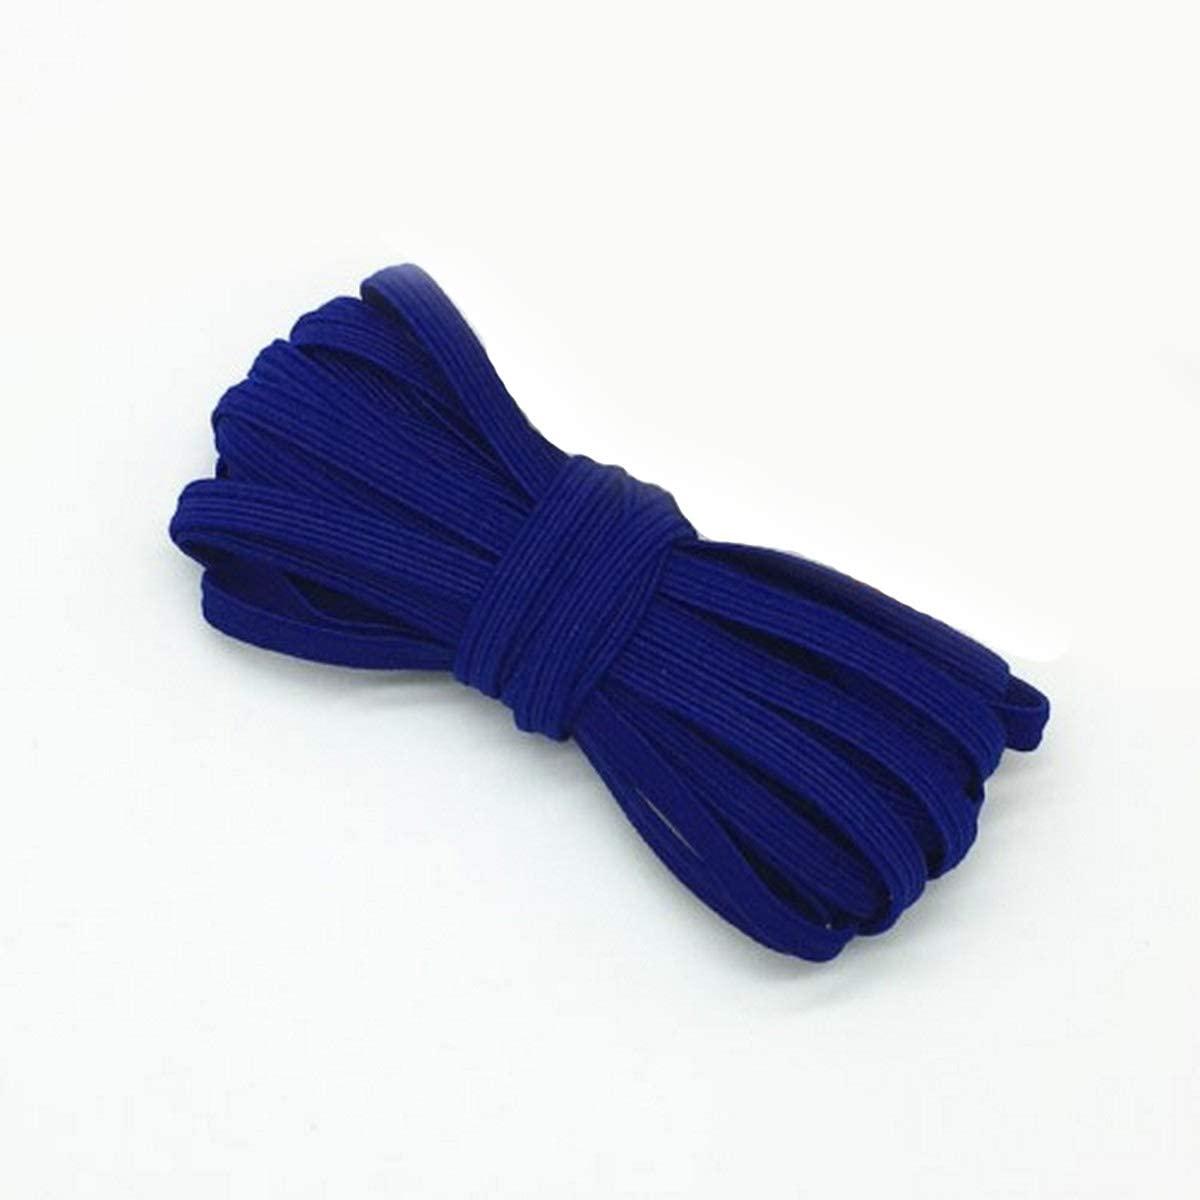 1/4 inch Elastic Ribbon High-Elastic Elastic Band Rubber Band Elastic Line DIY Lace Trim Sewing Waist Band Garment Accessories 4 Yards - Blue